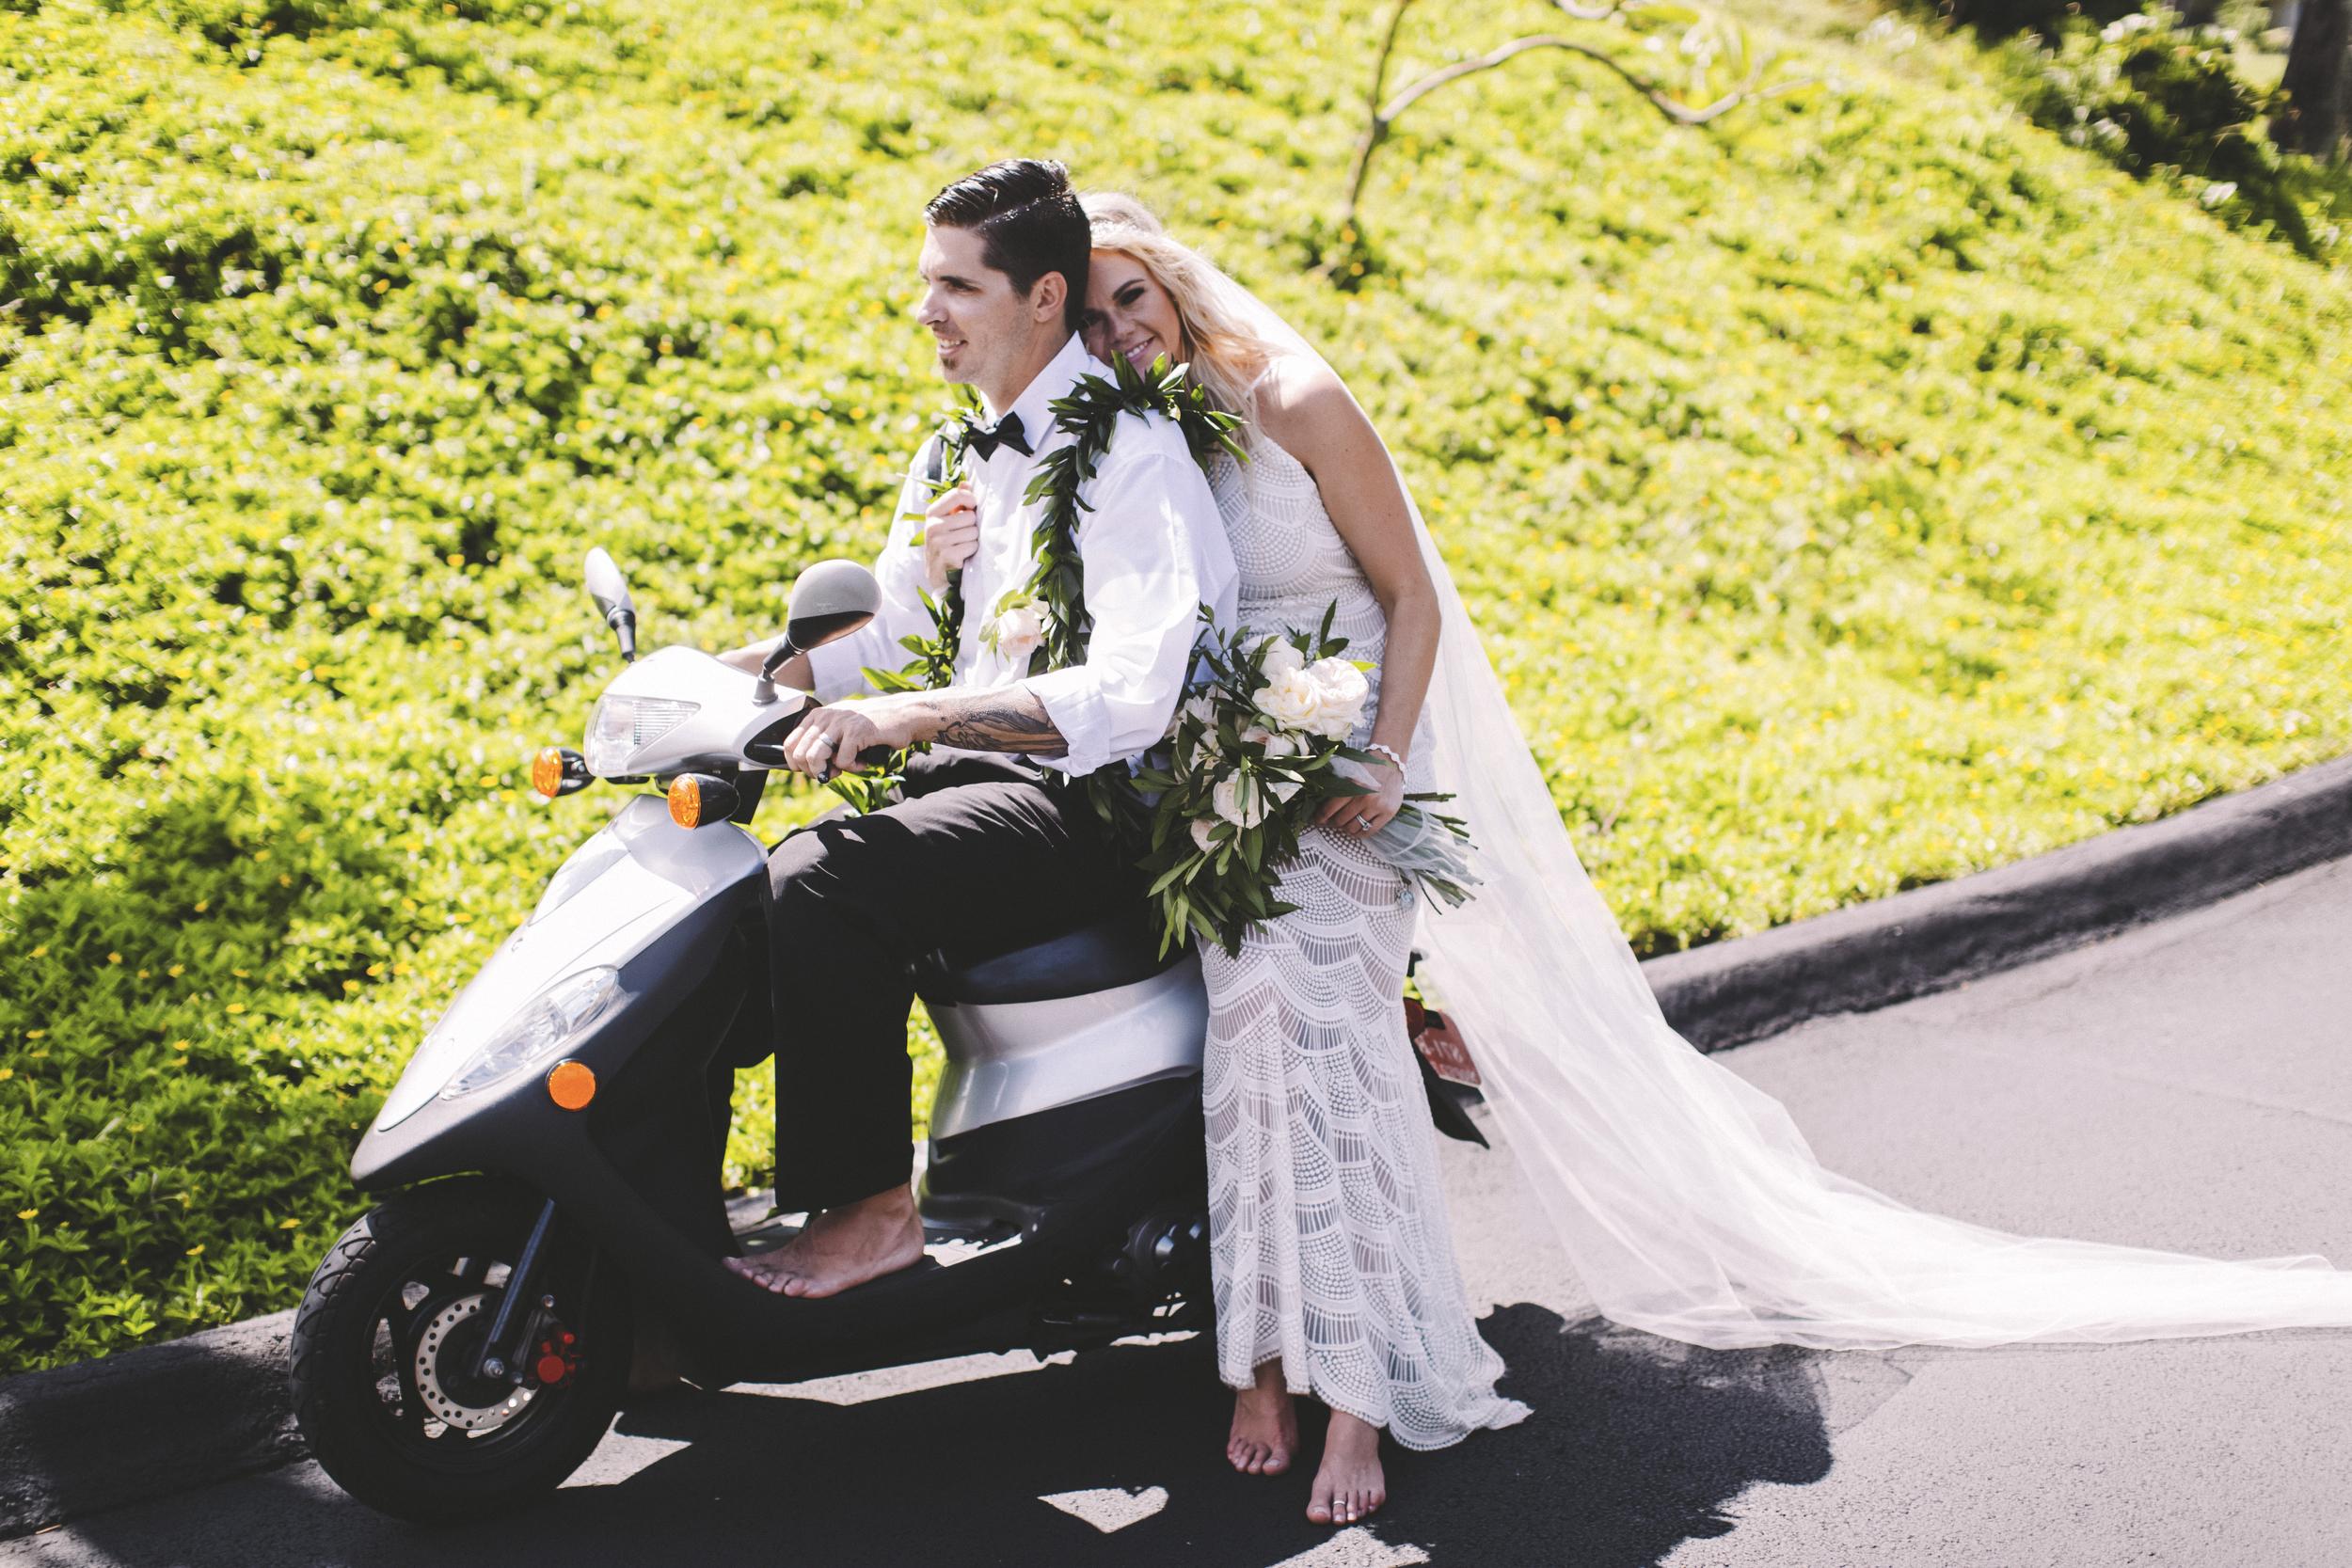 angie-diaz-photography-hawaii-wedding-57.jpg